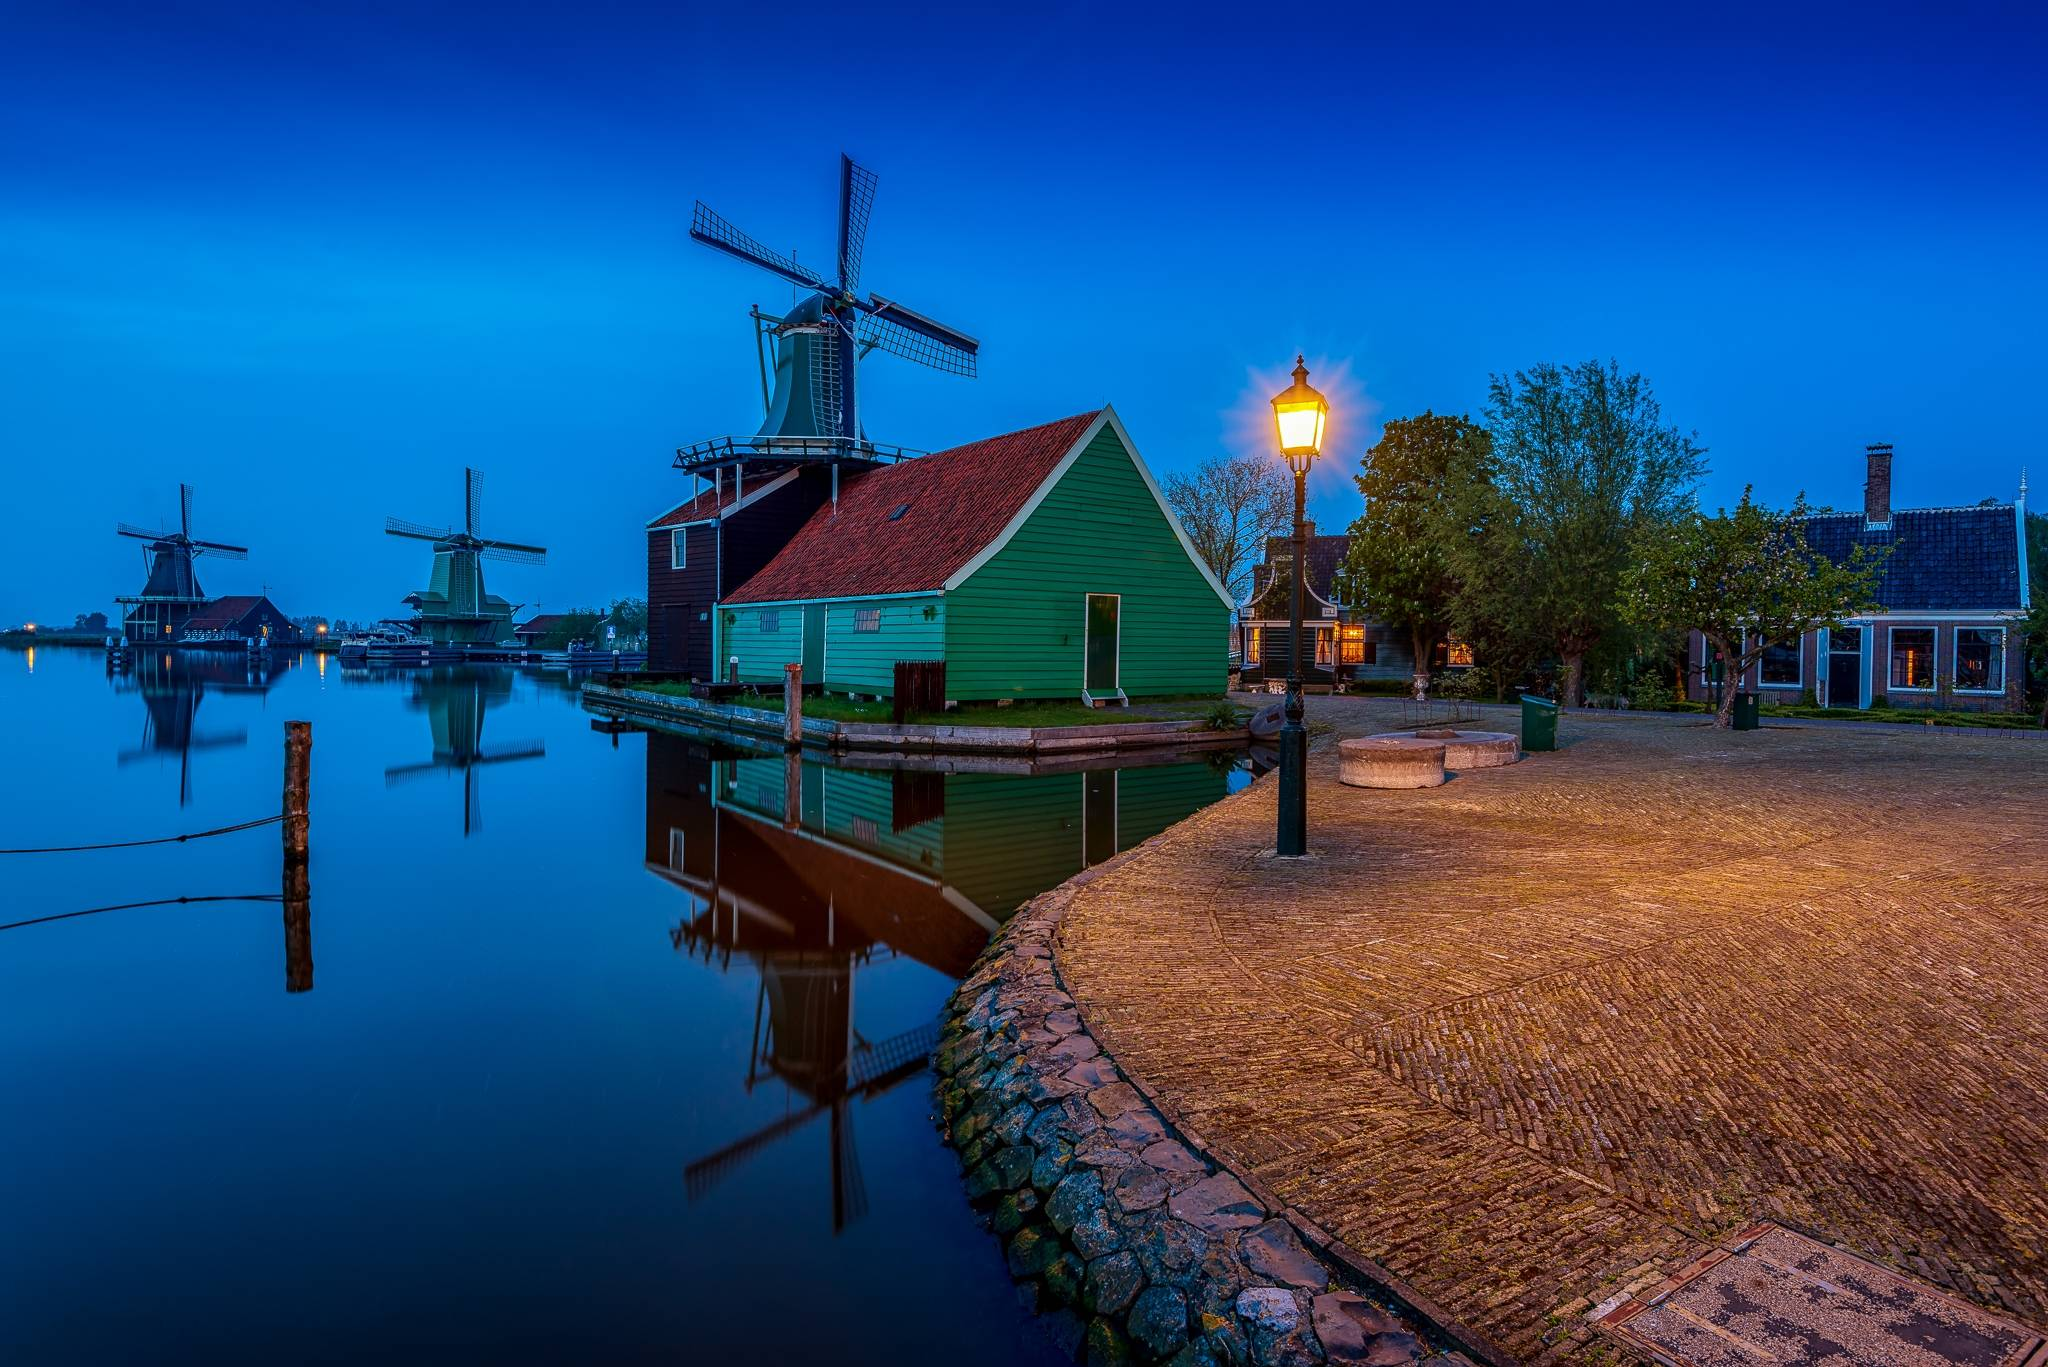 деревня Заансе Сханс, Нидерланды, закат